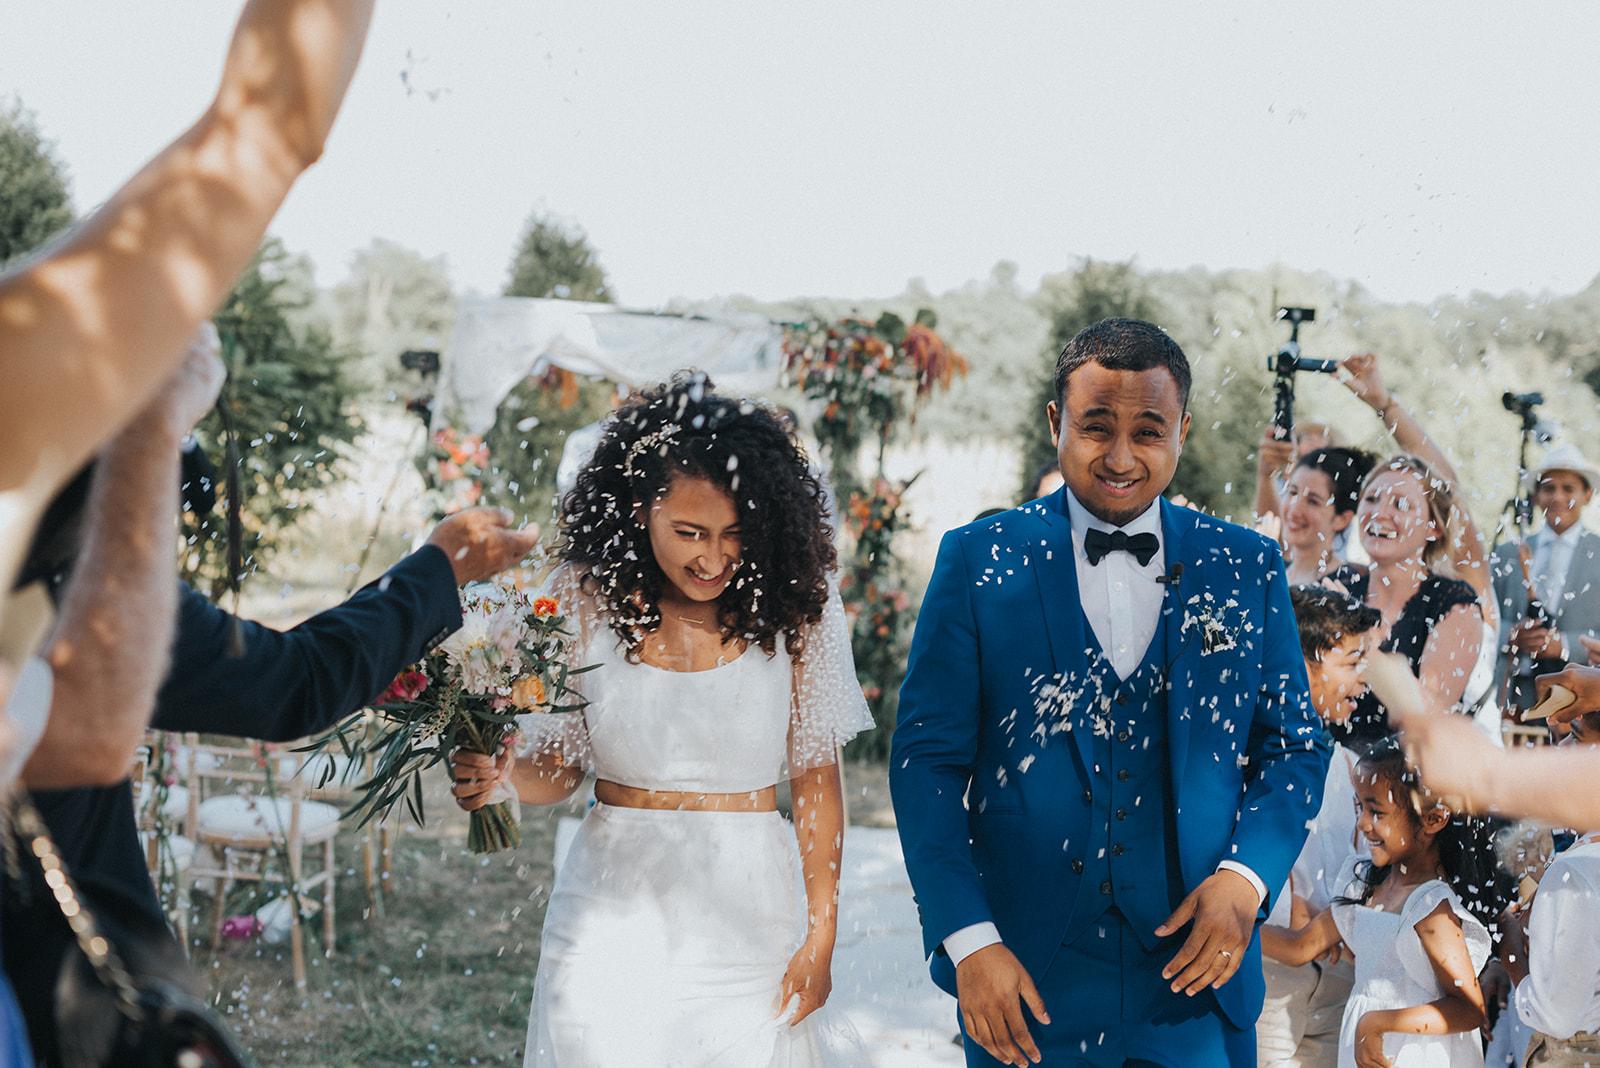 Mariage de Teddy et Arielle-397.jpg